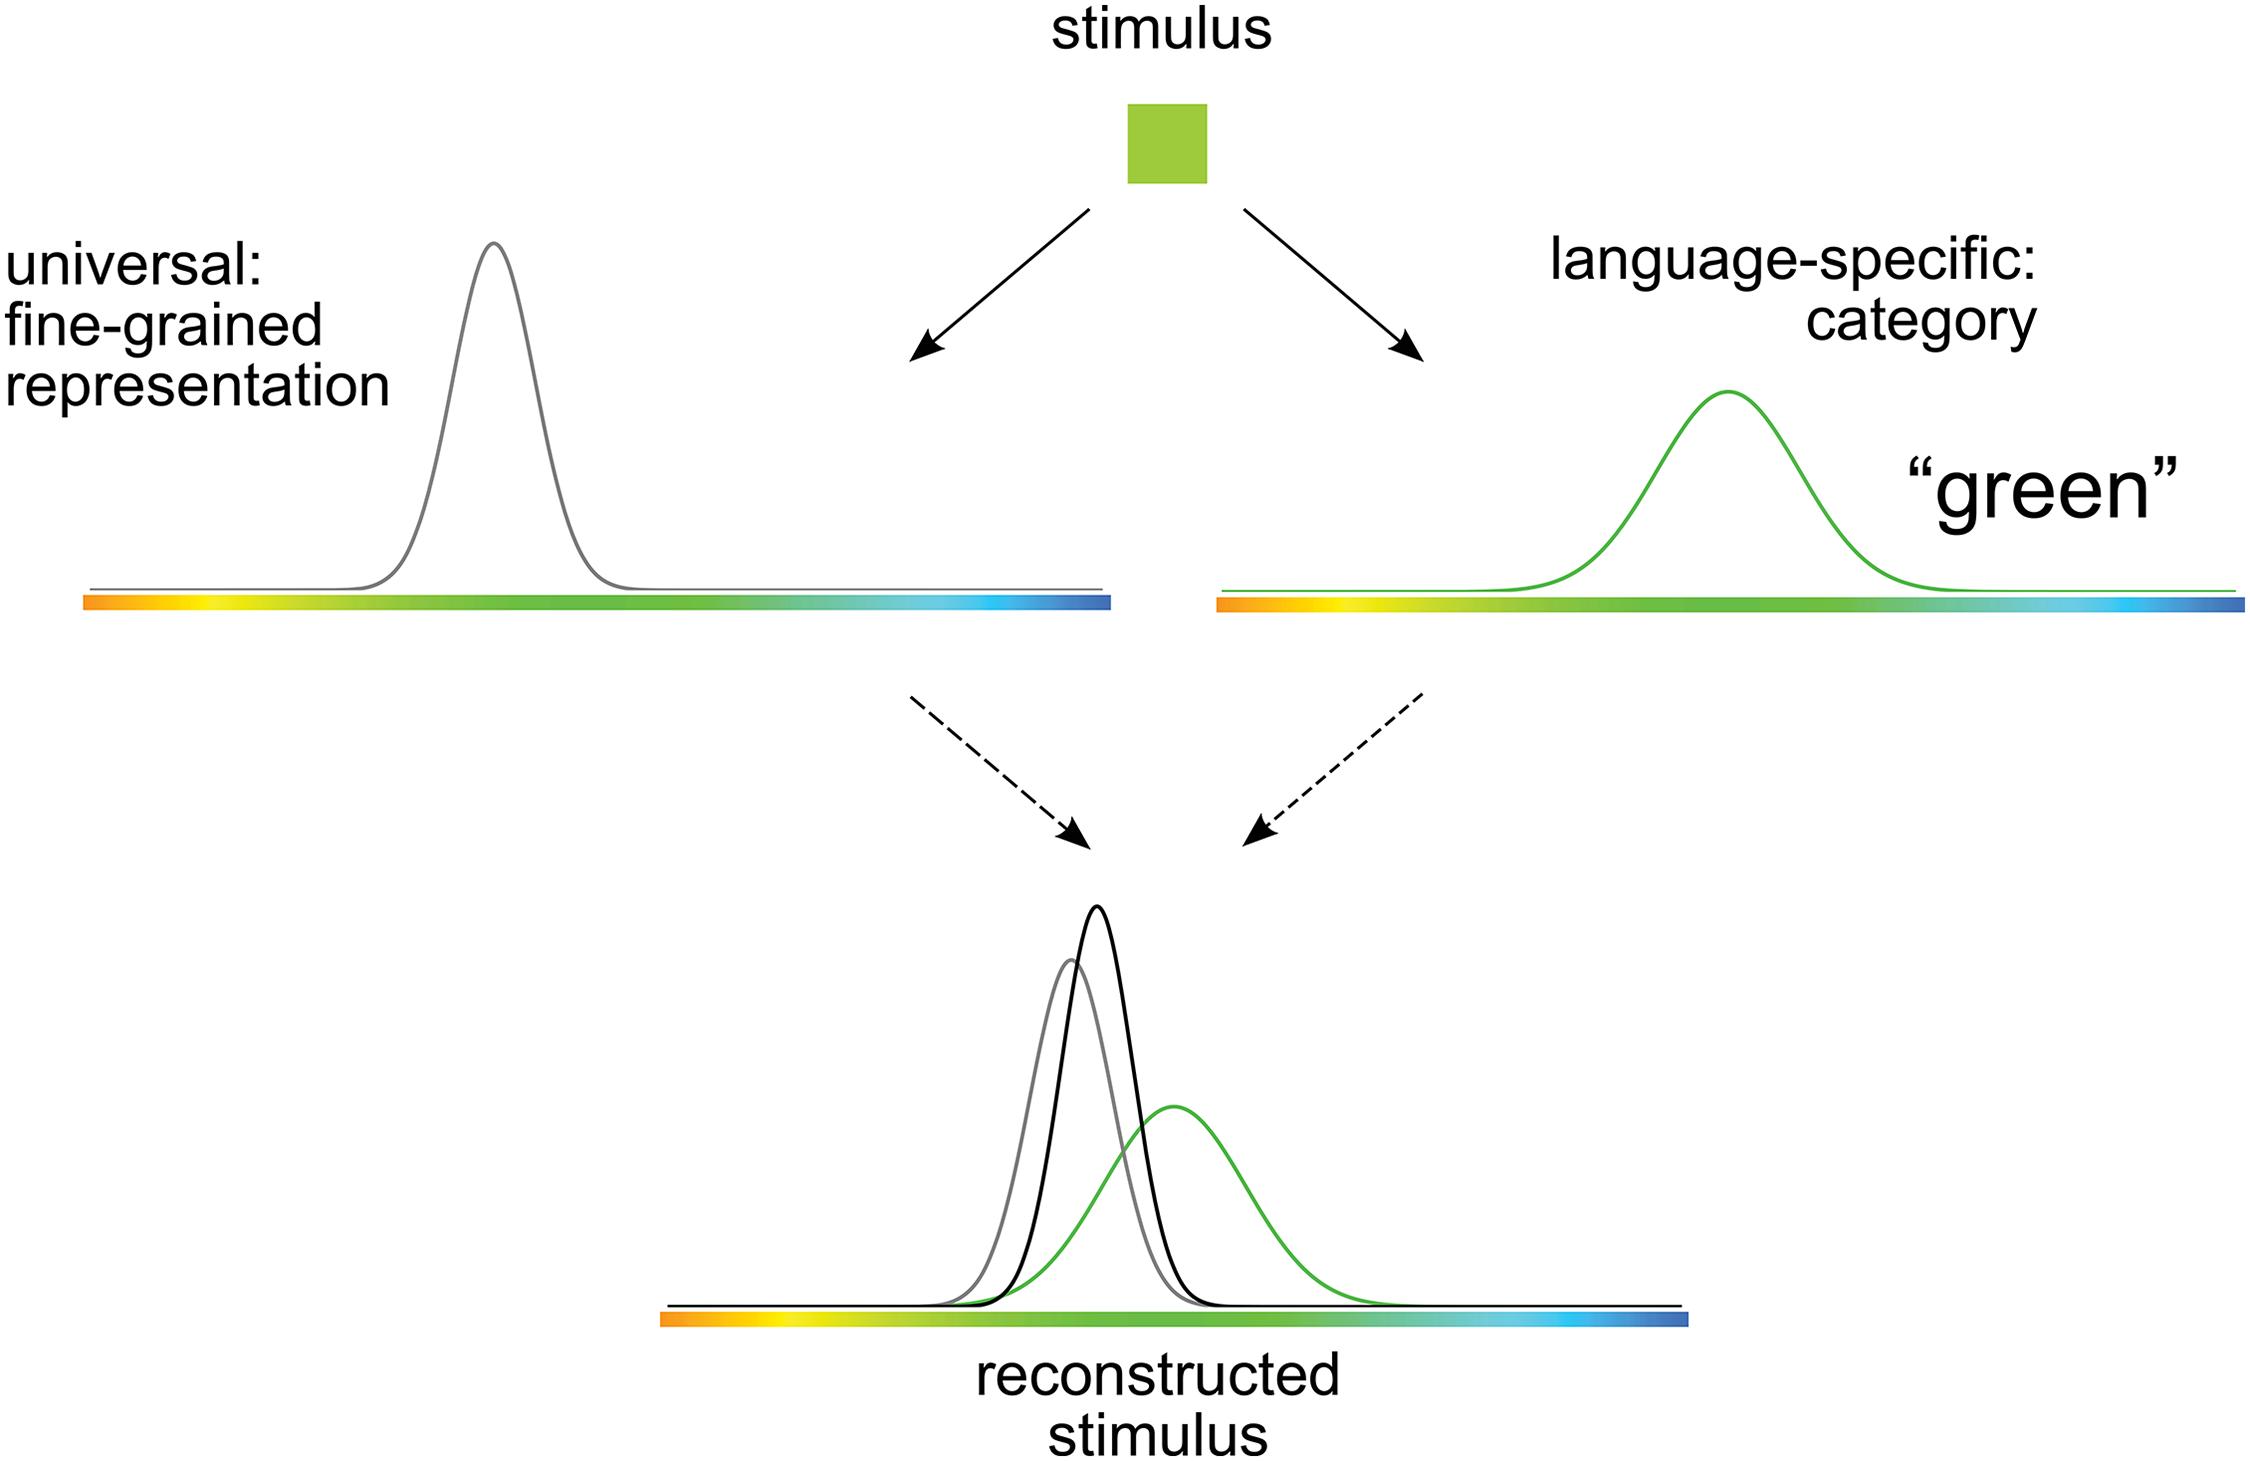 Cibelli et al. 2016, Figure 1